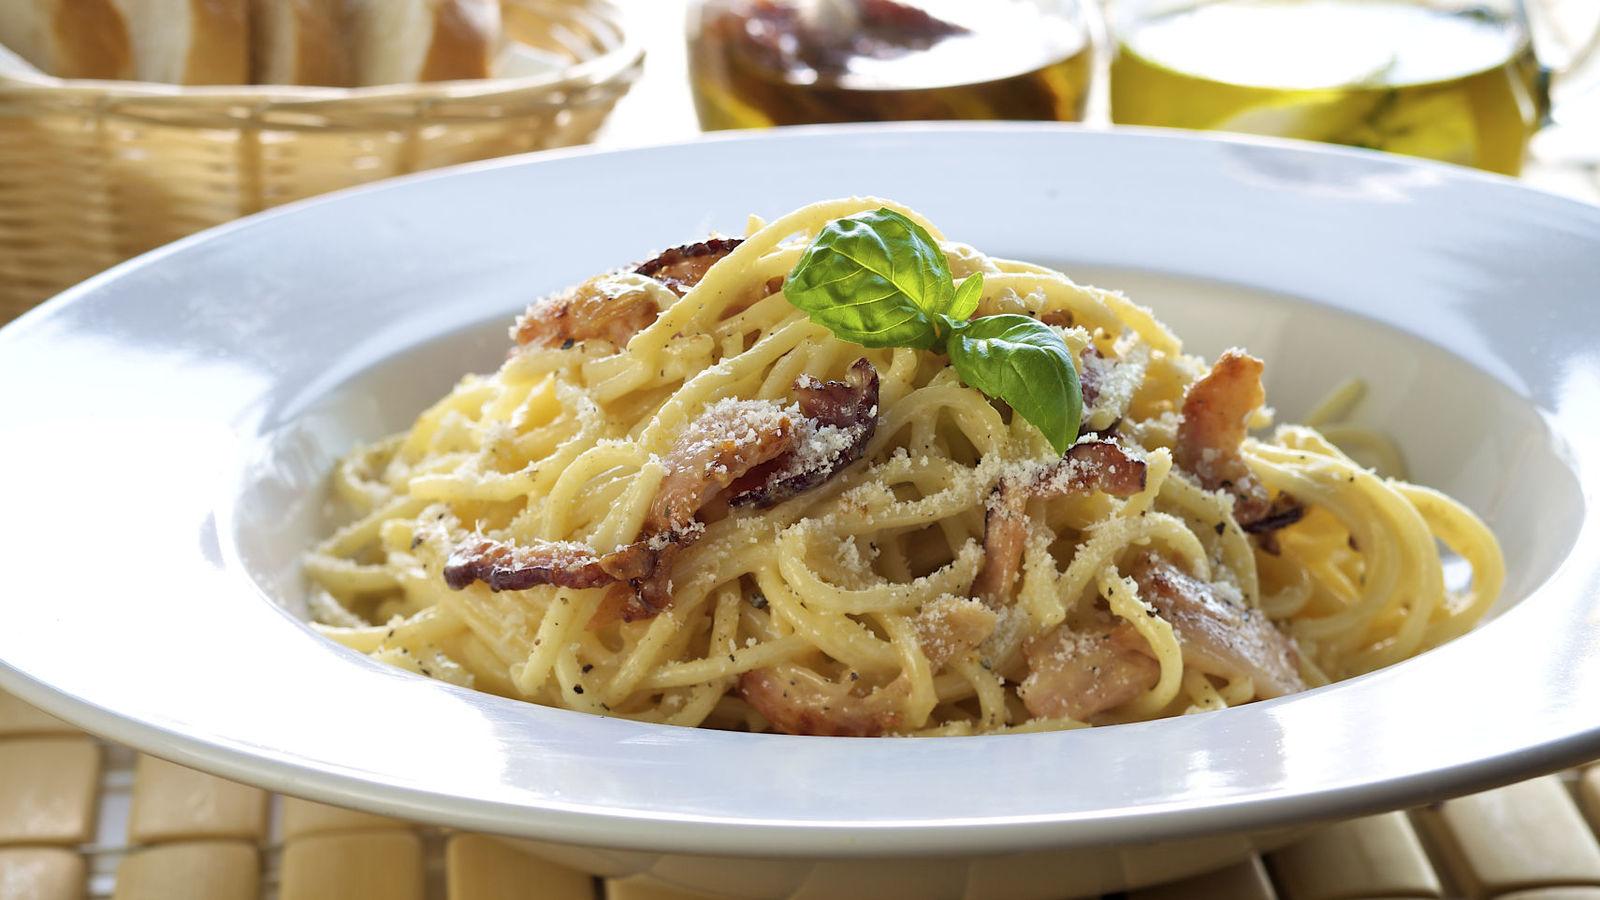 espaguetis a la carbonara sin nata - espaguetis a la carbonara sin nata